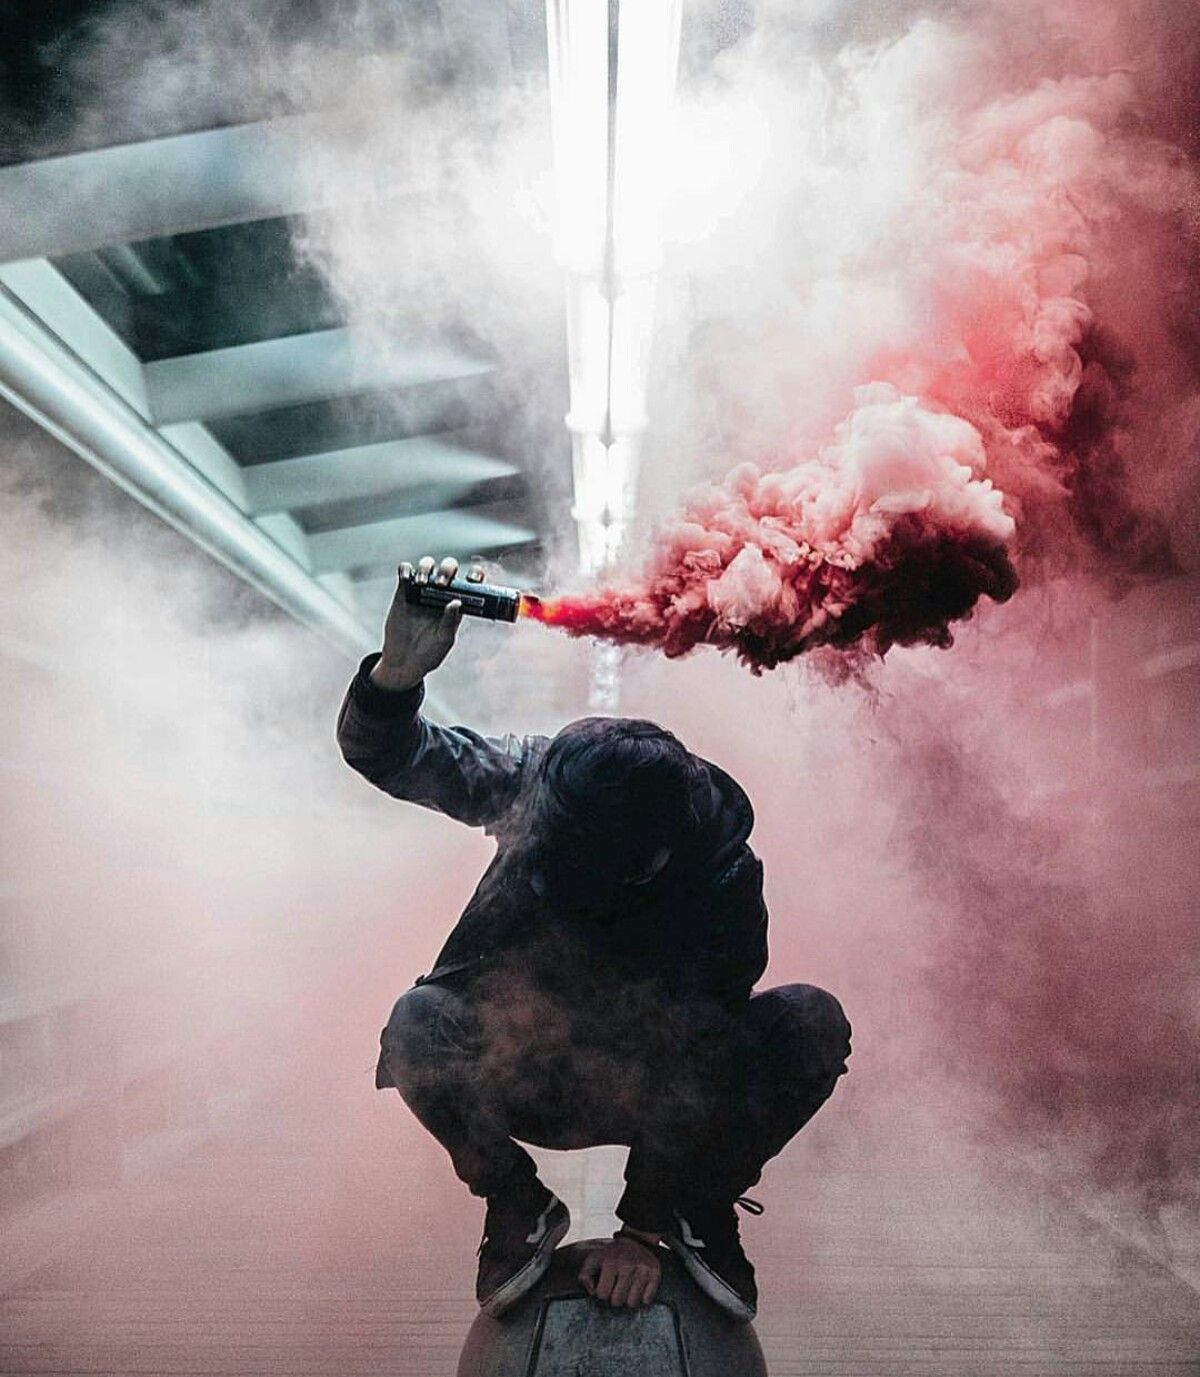 smoke-bomb-for-photography-photo-retouching-sample | Photo Color